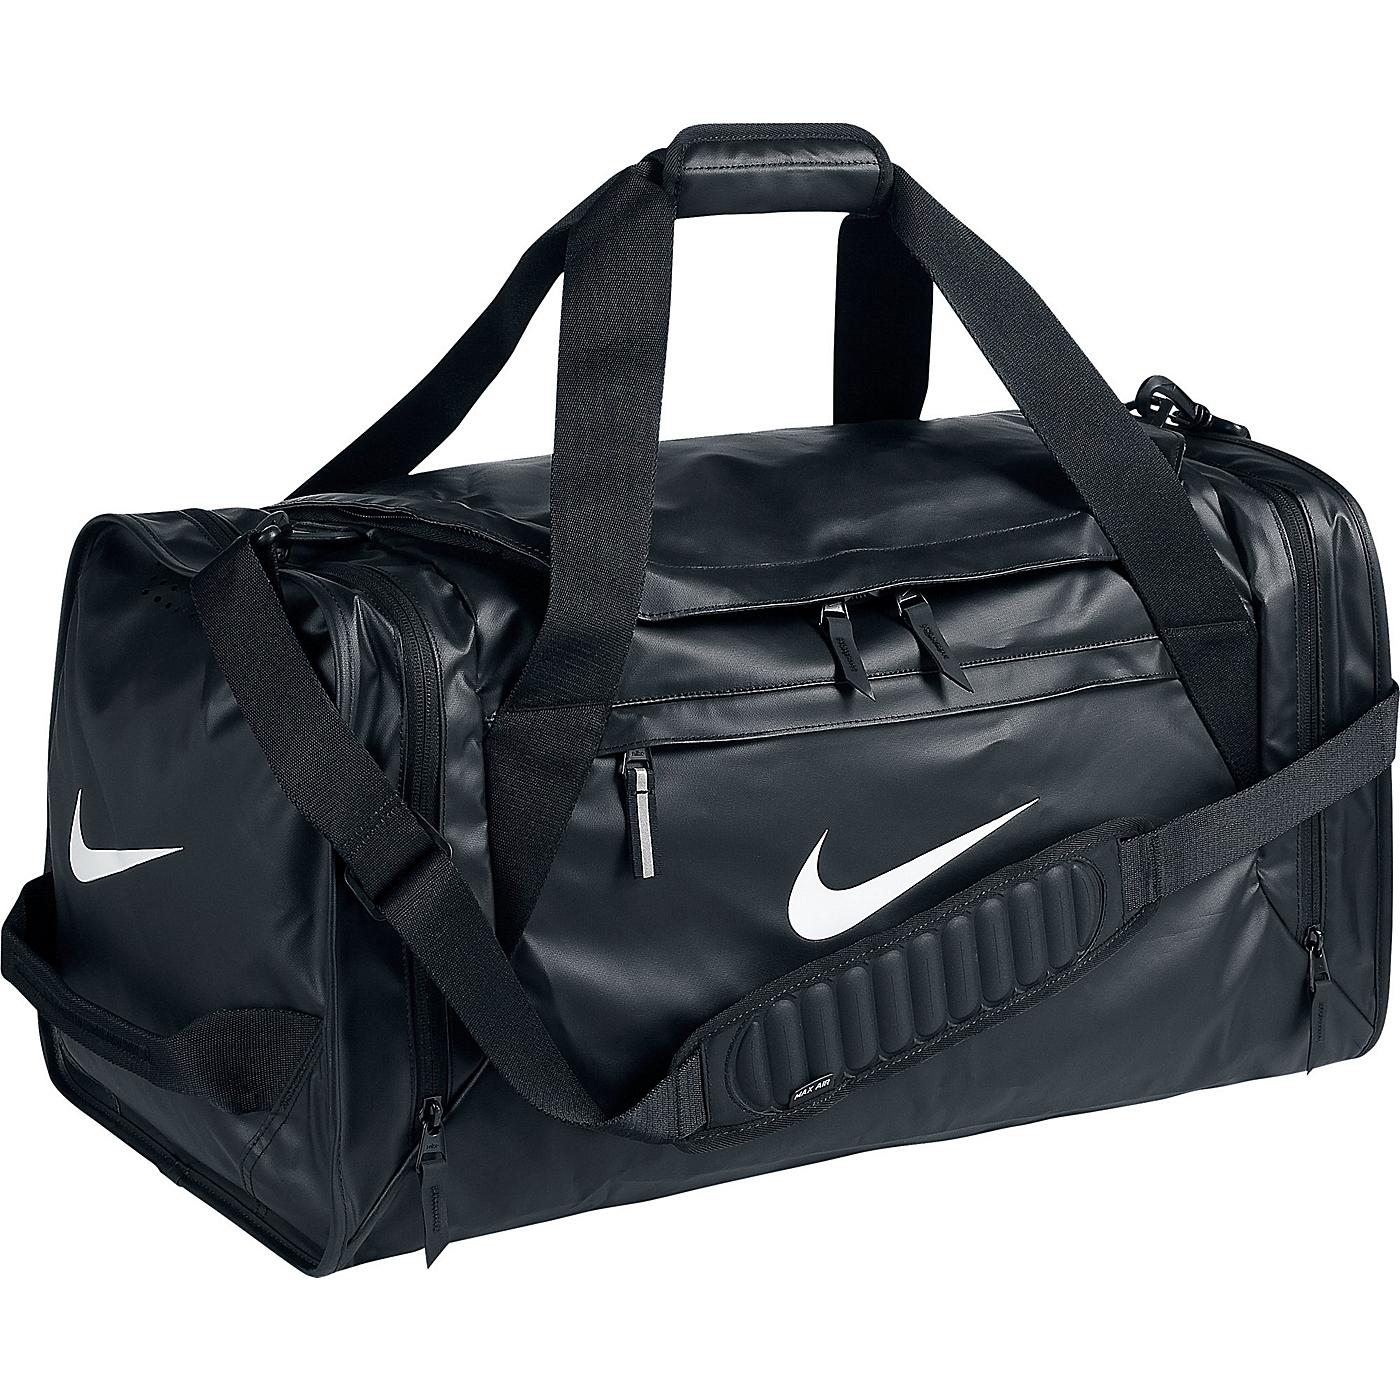 32fdea1f24 eBags. Ultimatum Max Air Medium Duffel Black Black (White) Nike All Purpose  Duff